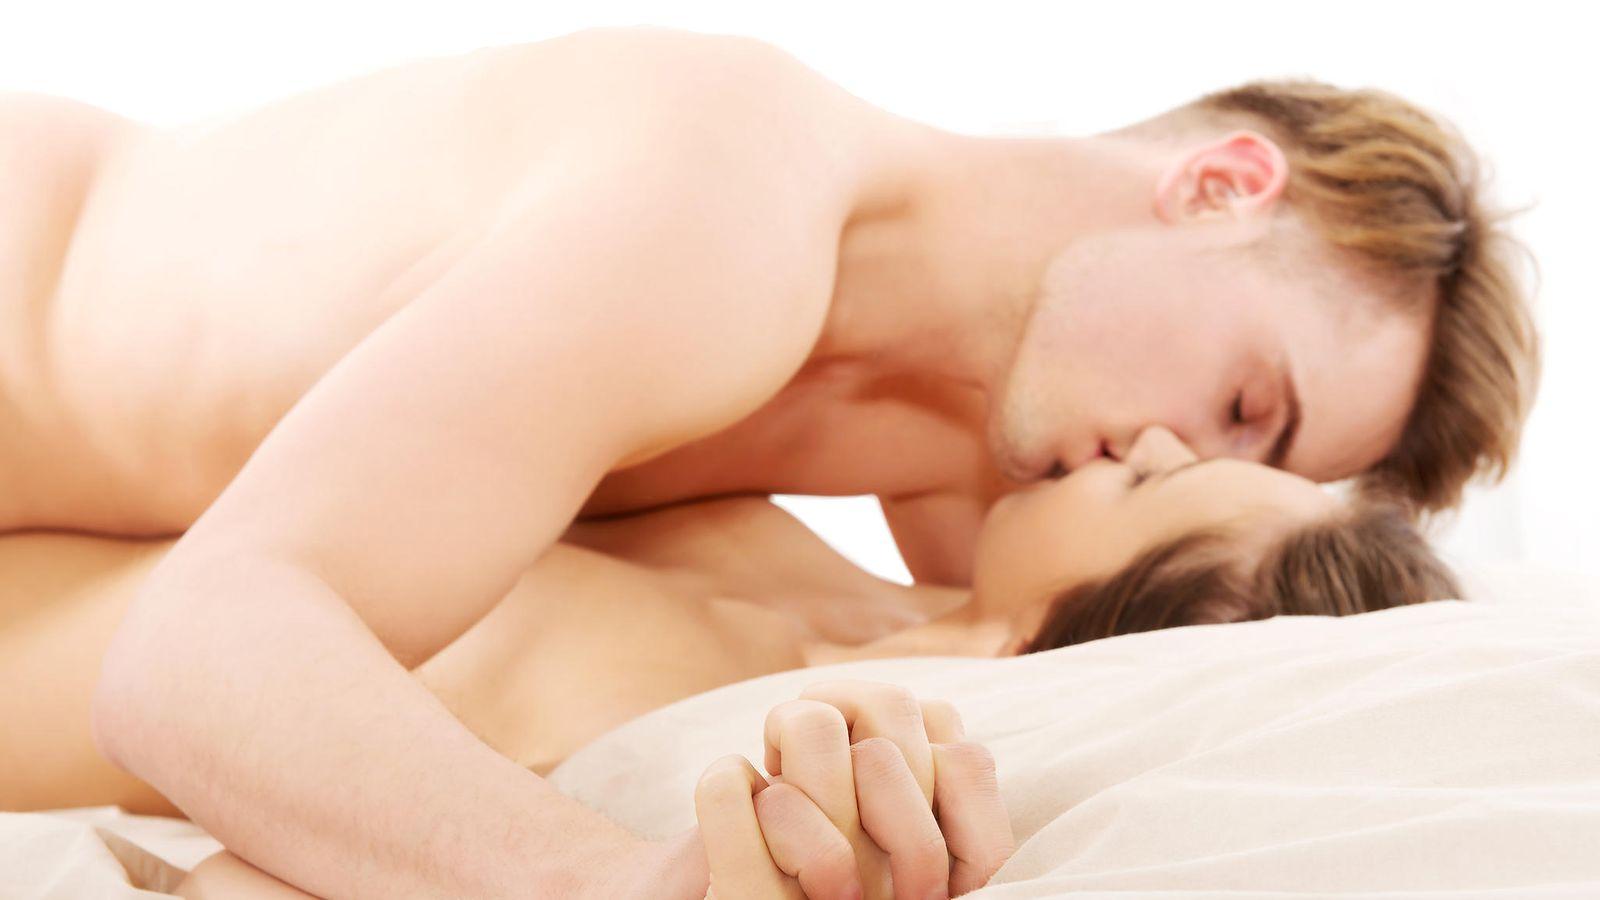 sex work finland ryhmäseksi tarinat